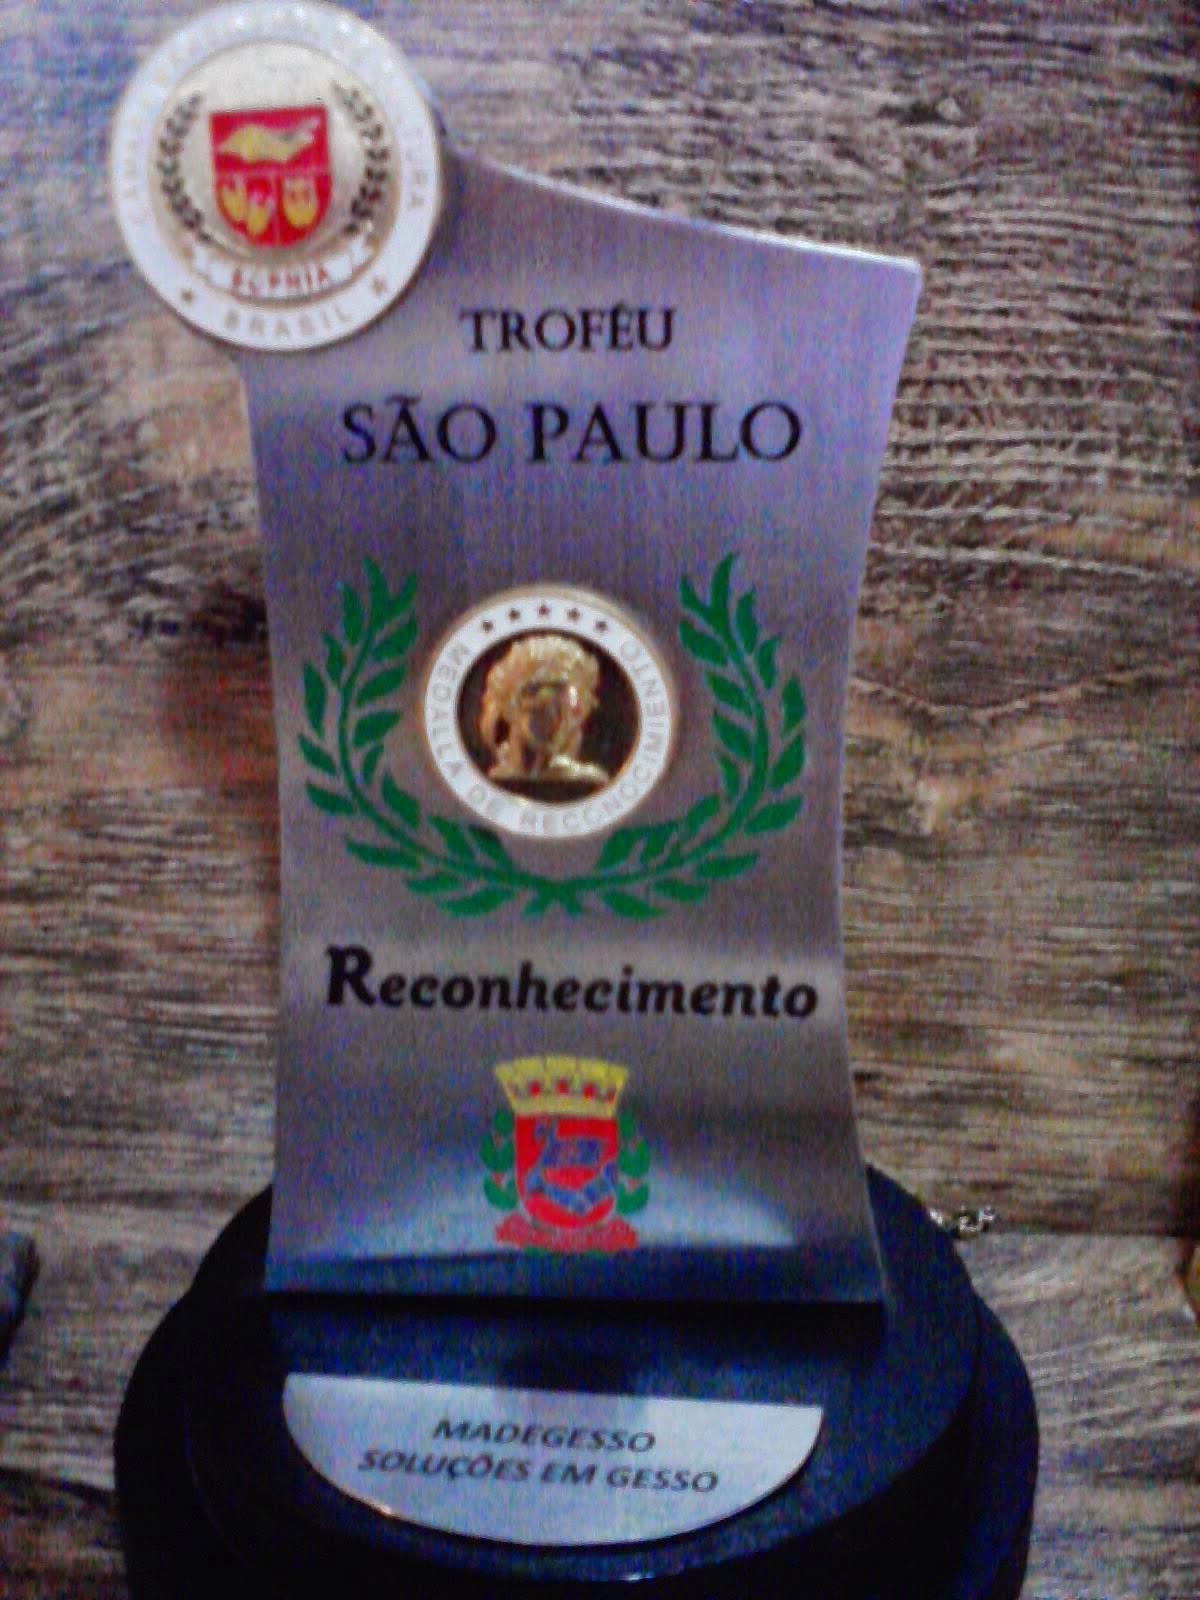 Troféu São Paulo